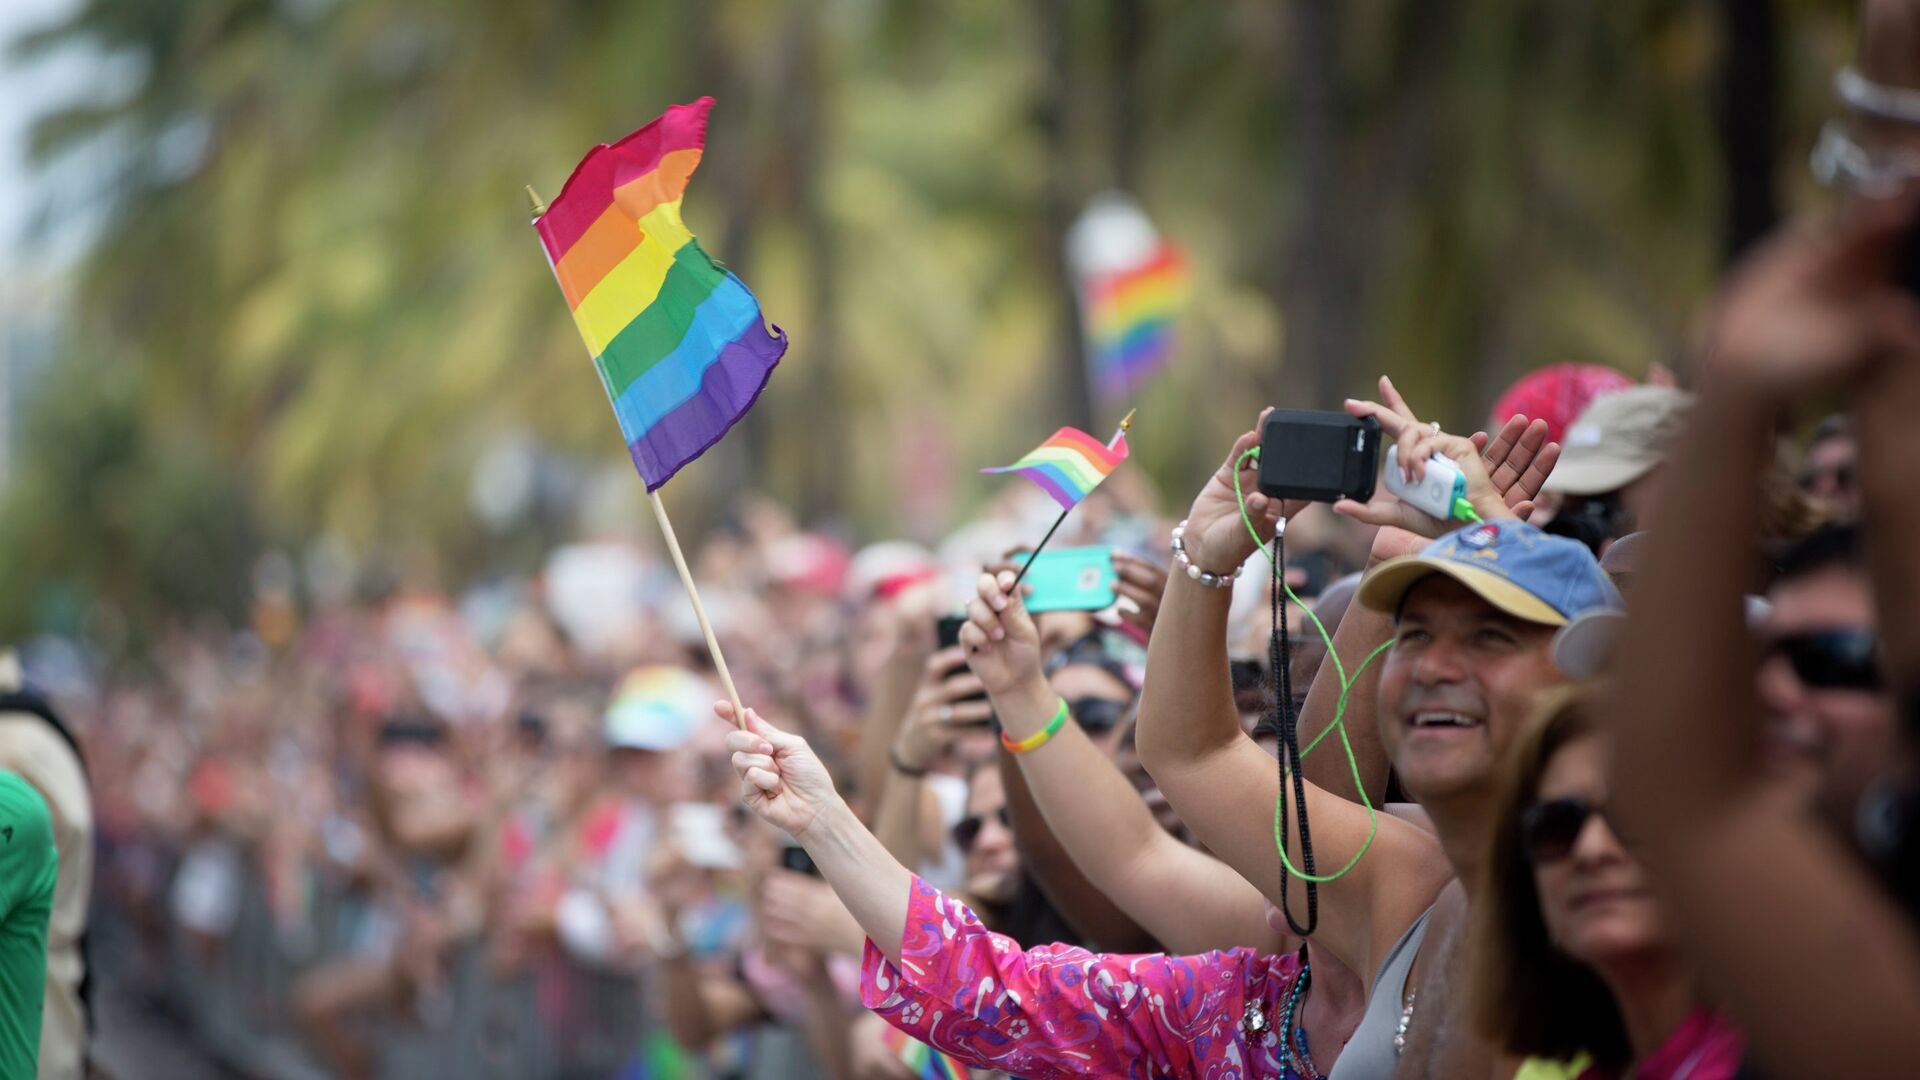 Гей-парад во Флориде, США - РИА Новости, 1920, 30.06.2021